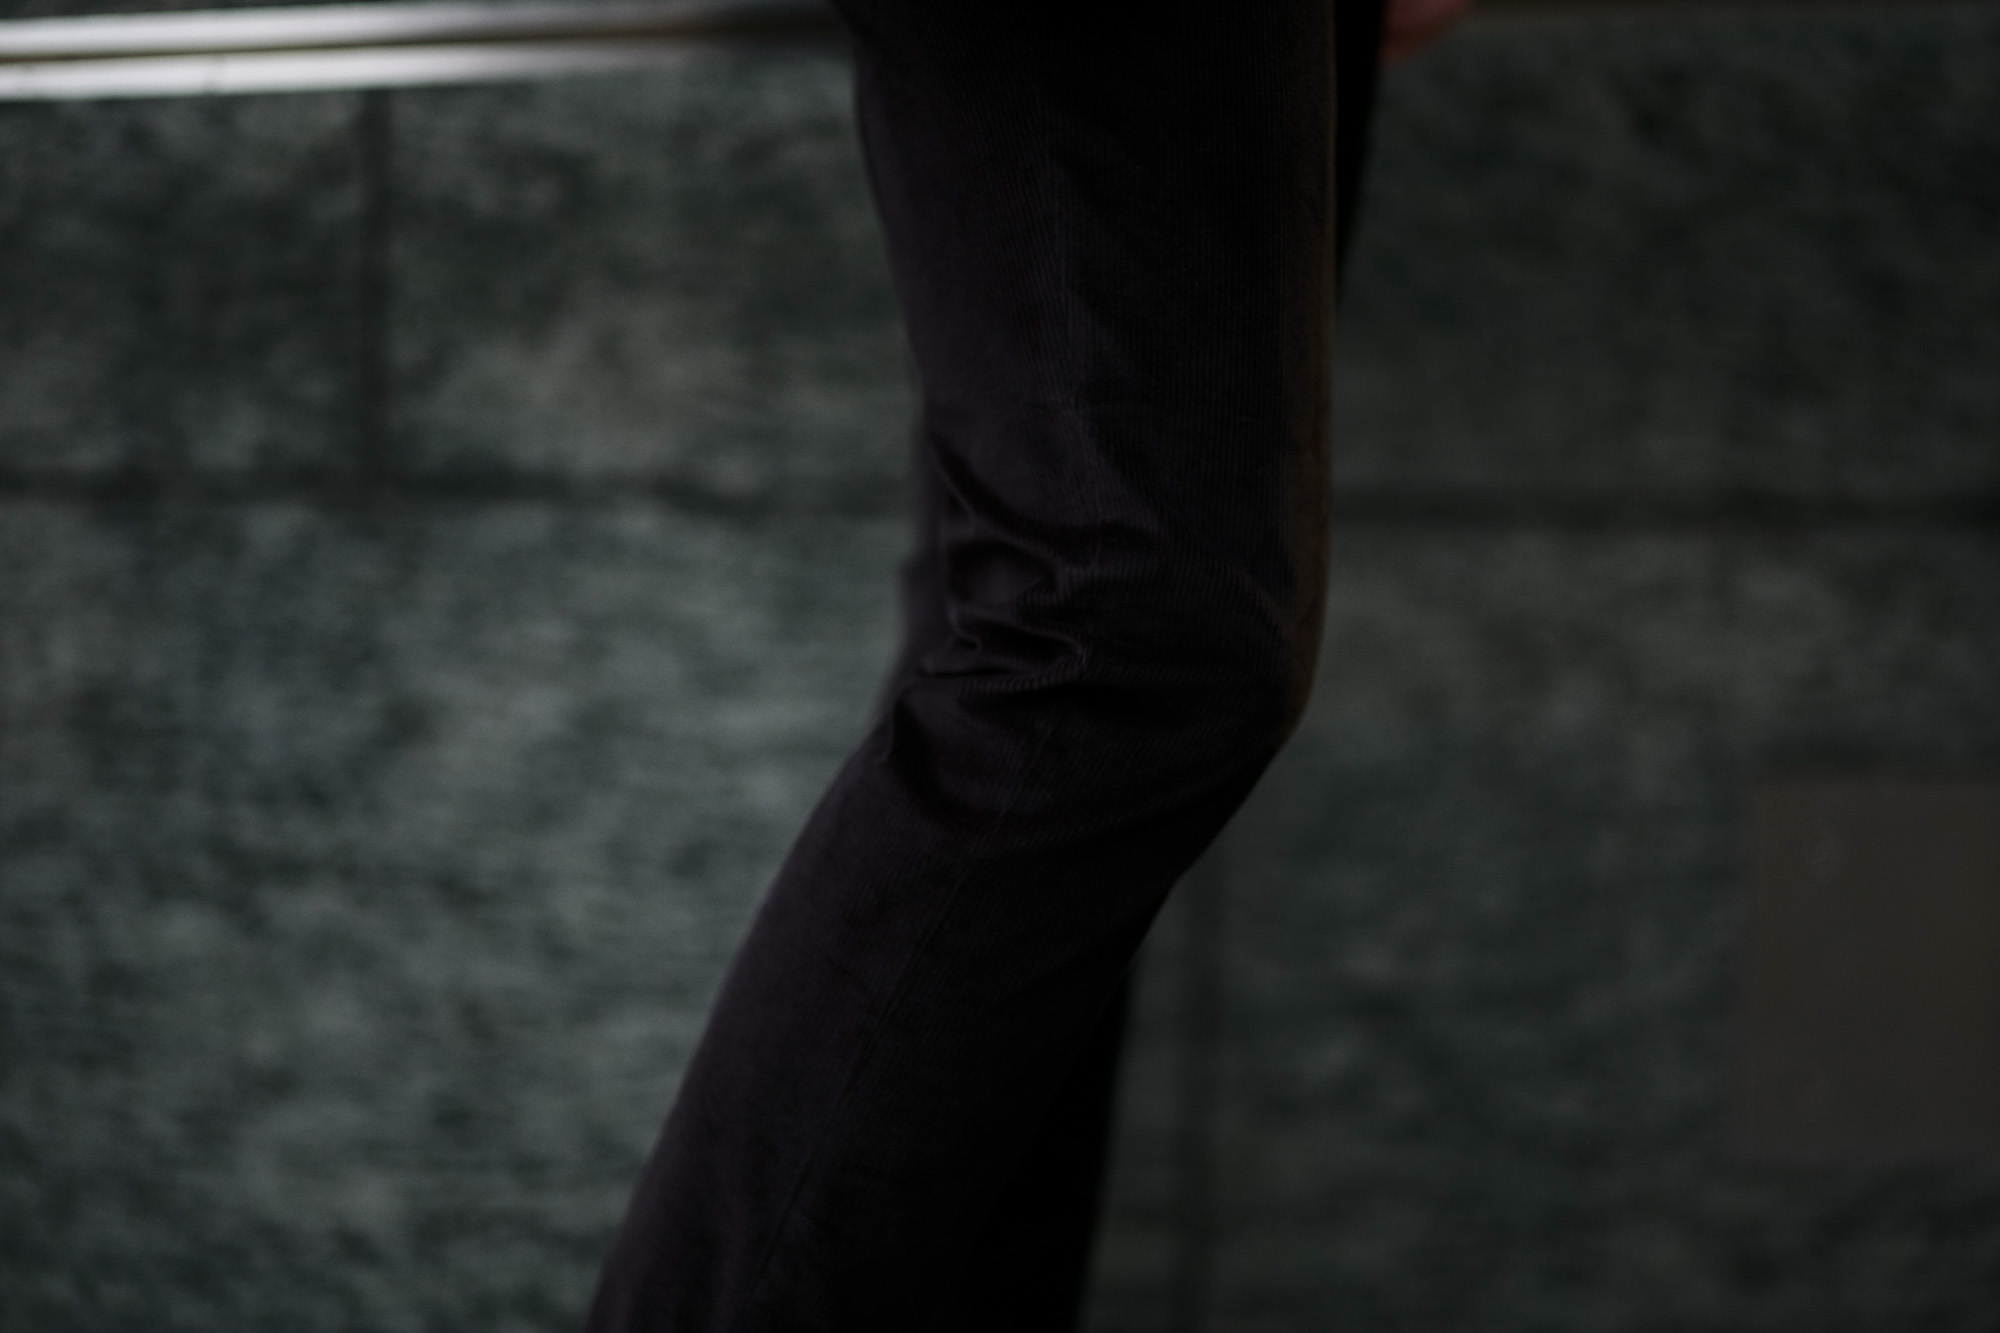 Cuervo (クエルボ) Sartoria Collection (サルトリア コレクション) Rooster (ルースター) STRETCH Corduroy ストレッチコーデュロイ スーツ BLACK (ブラック) MADE IN JAPAN (日本製) 2019 秋冬新作 【ご予約開始】 愛知 名古屋 altoediritto アルトエデリット オーダースーツ オーダー